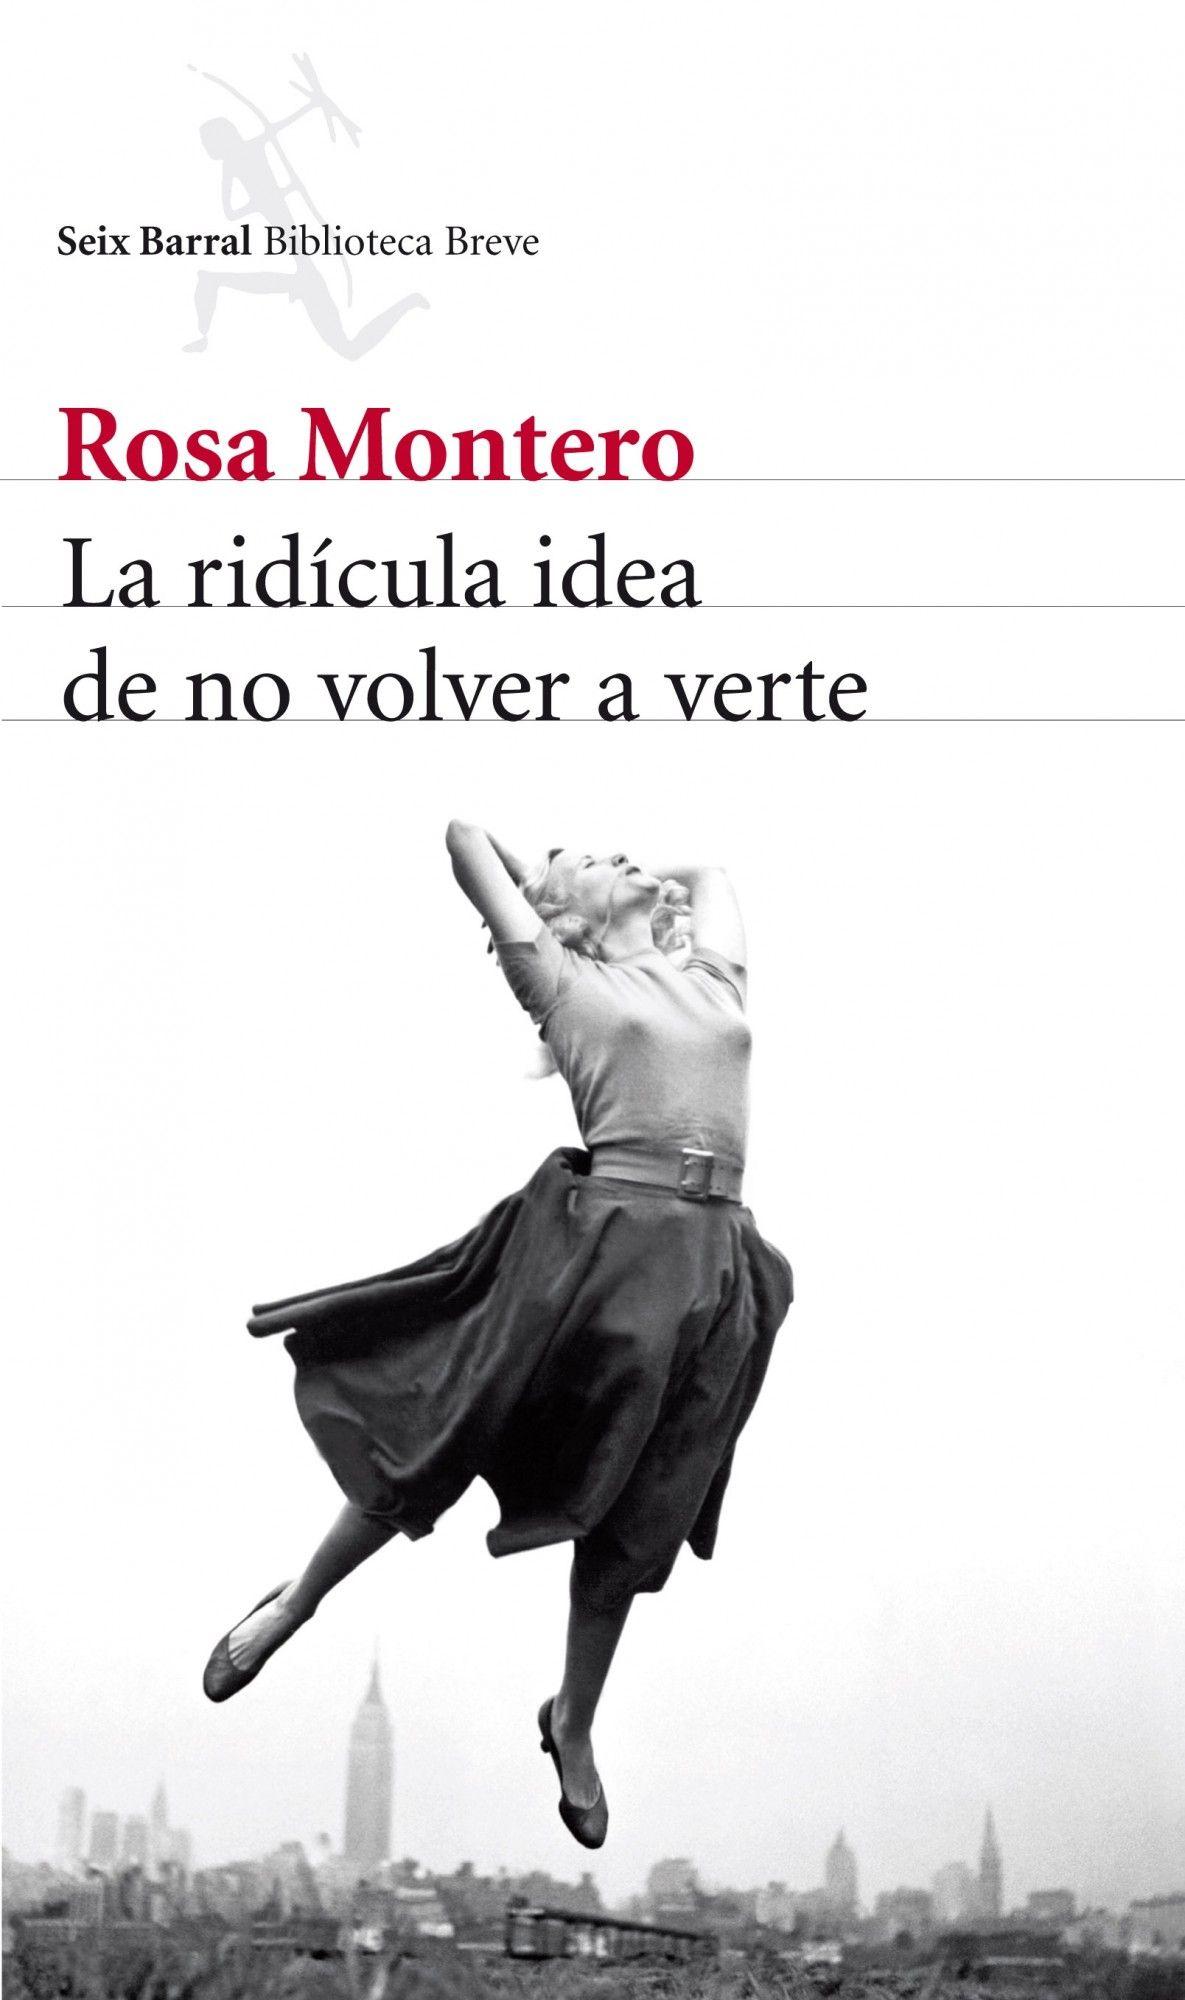 La Ridicula Idea de no Volver a Verte - Rosa Montero - Seix Barral